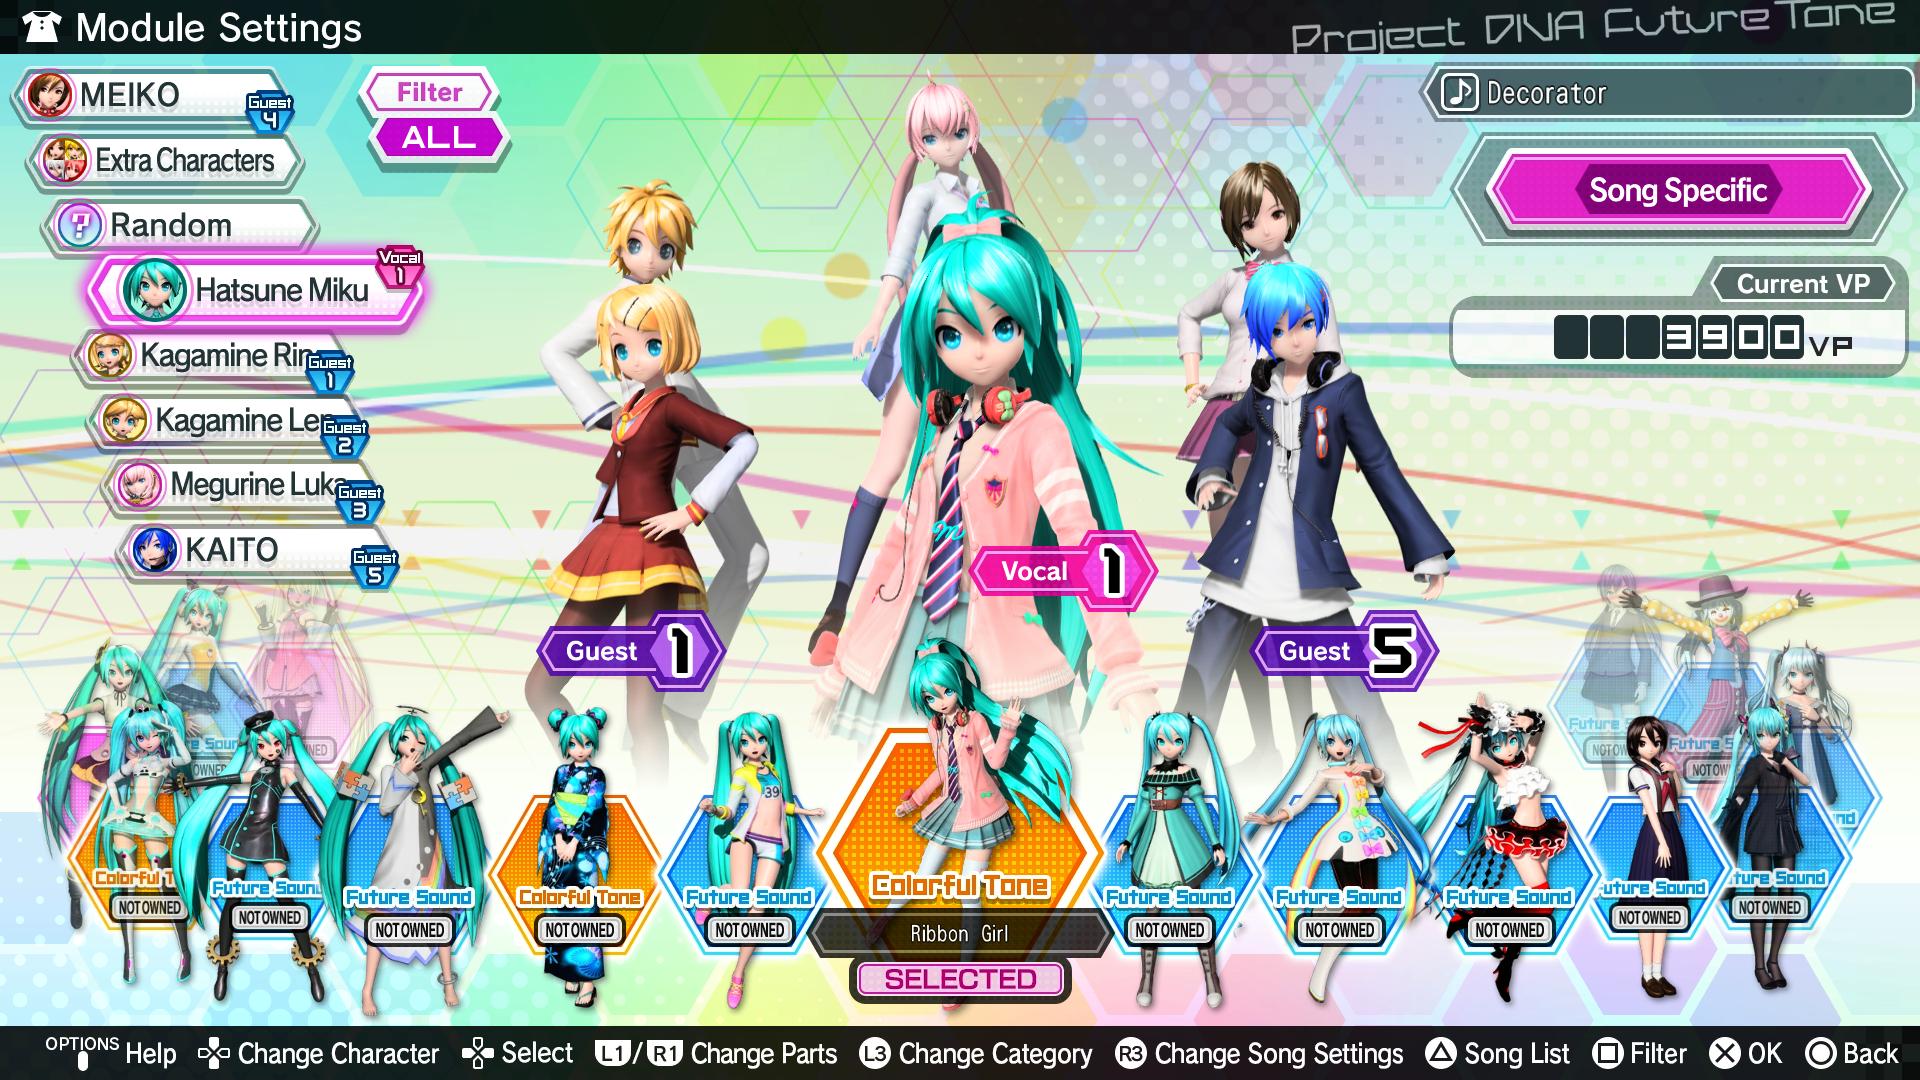 Dorazila Hatsune Miku s Projectem Diva Future Tone 136349